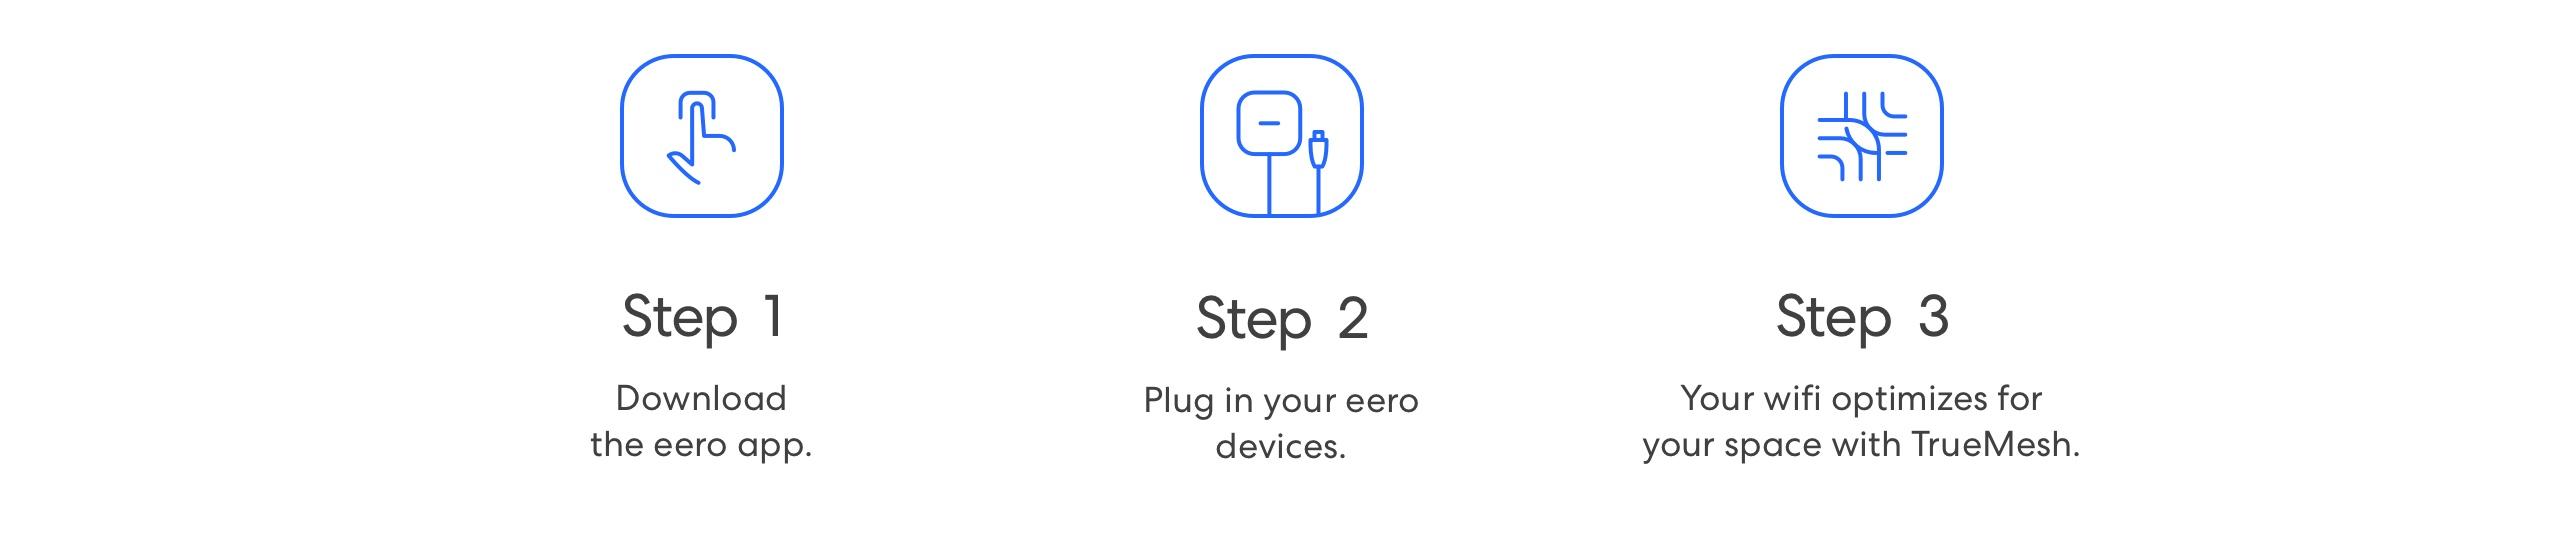 Steps to set up eero